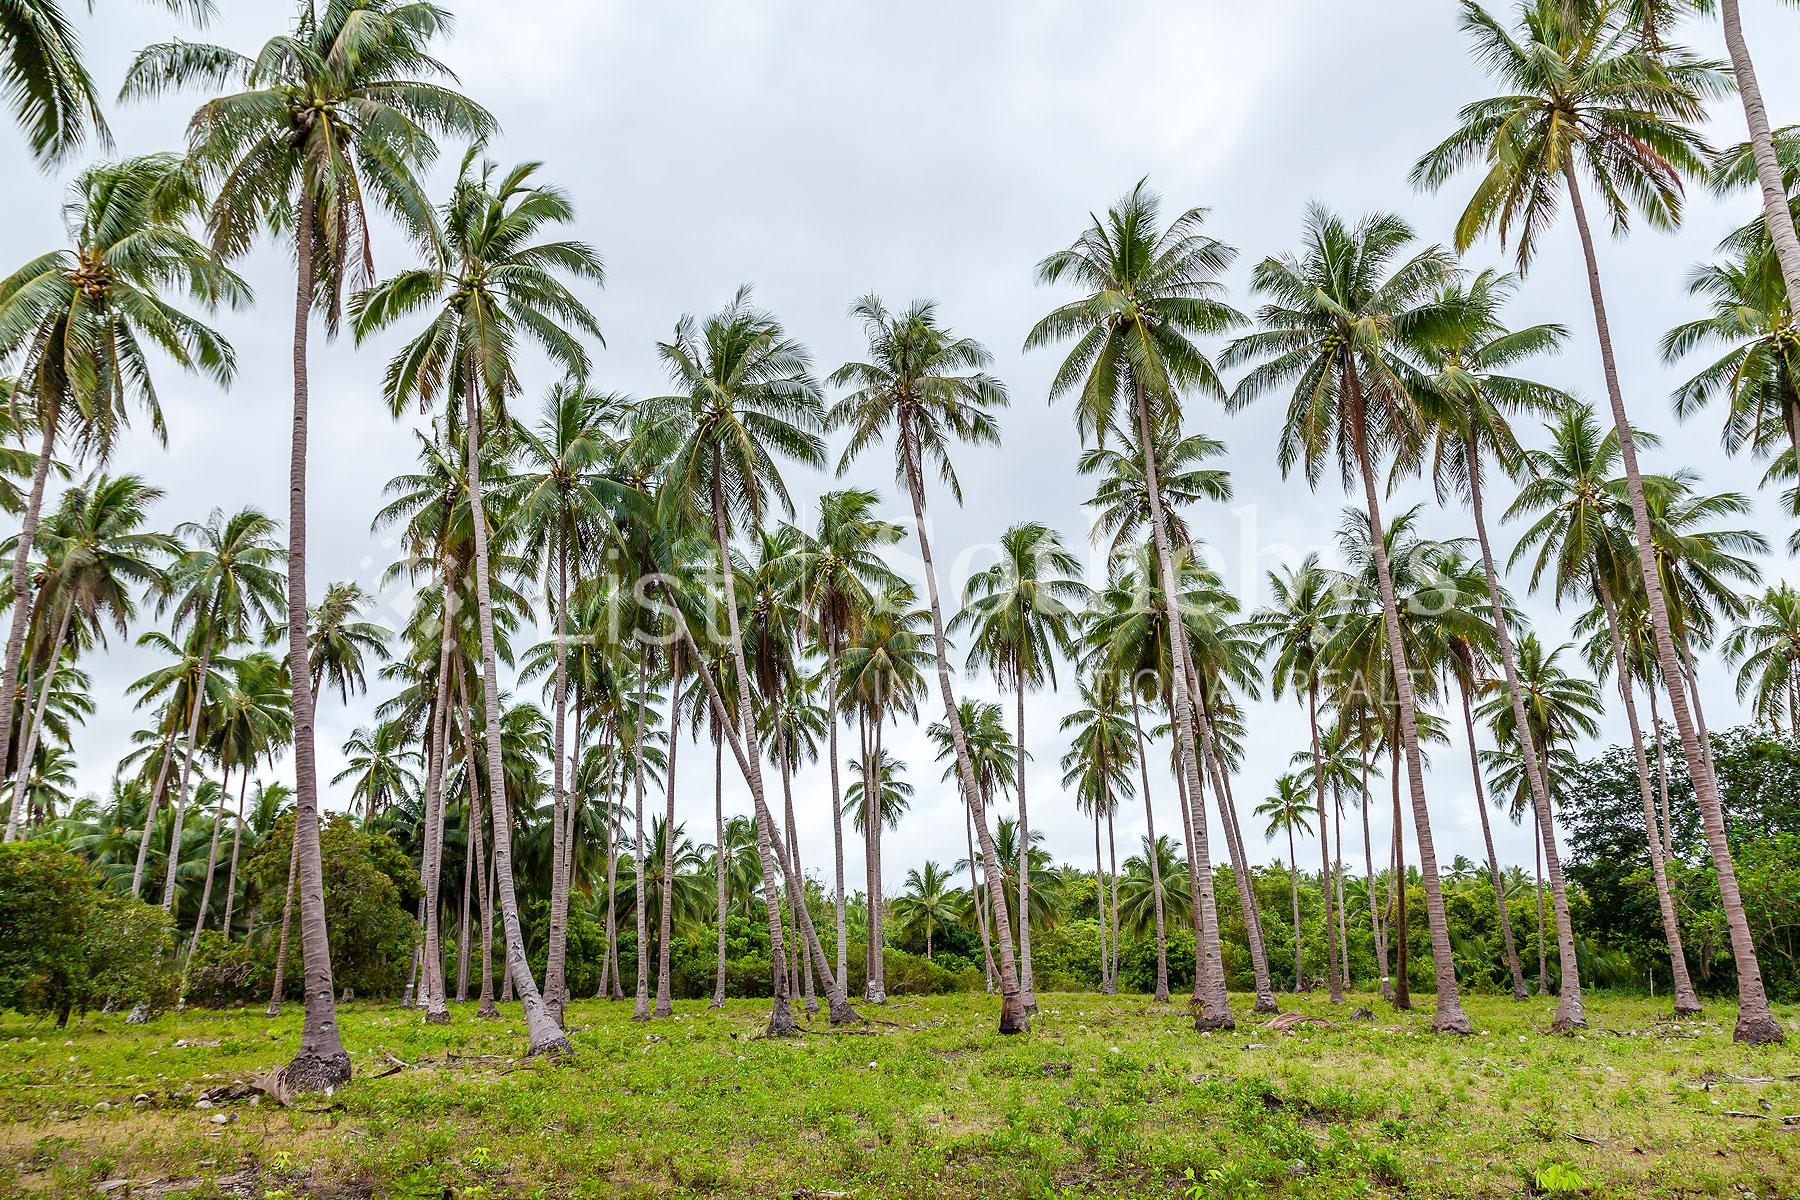 Additional photo for property listing at Brgy Alimanguan   San Vicente Palawan  San Vicente, Palawan 5309 Philippines